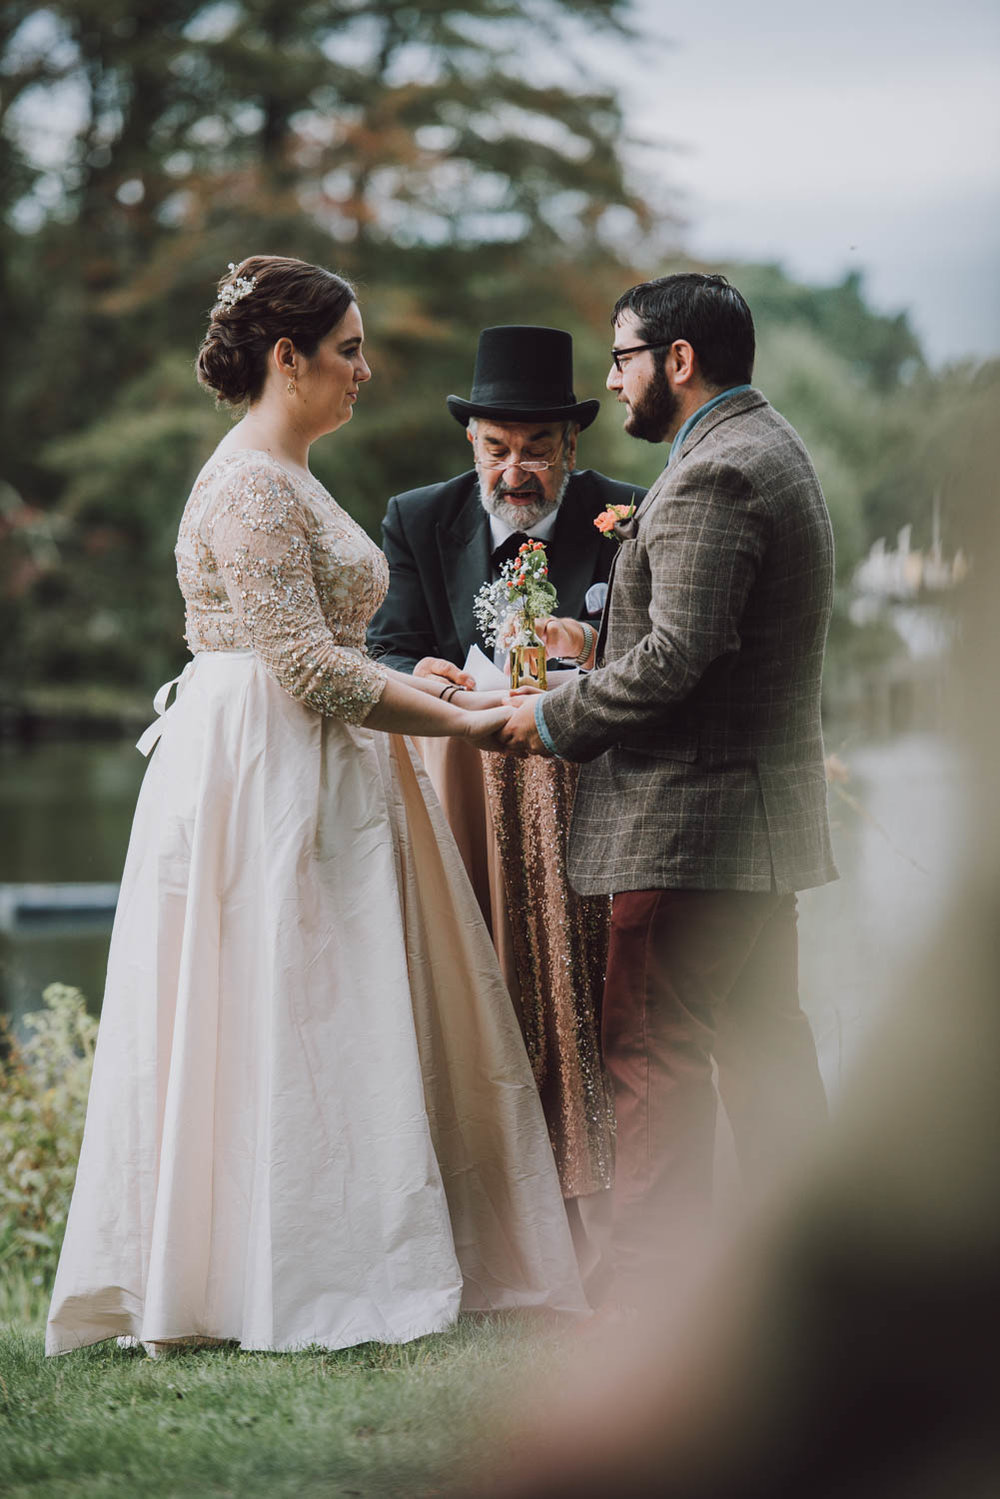 richards-wedding-photography11.jpg